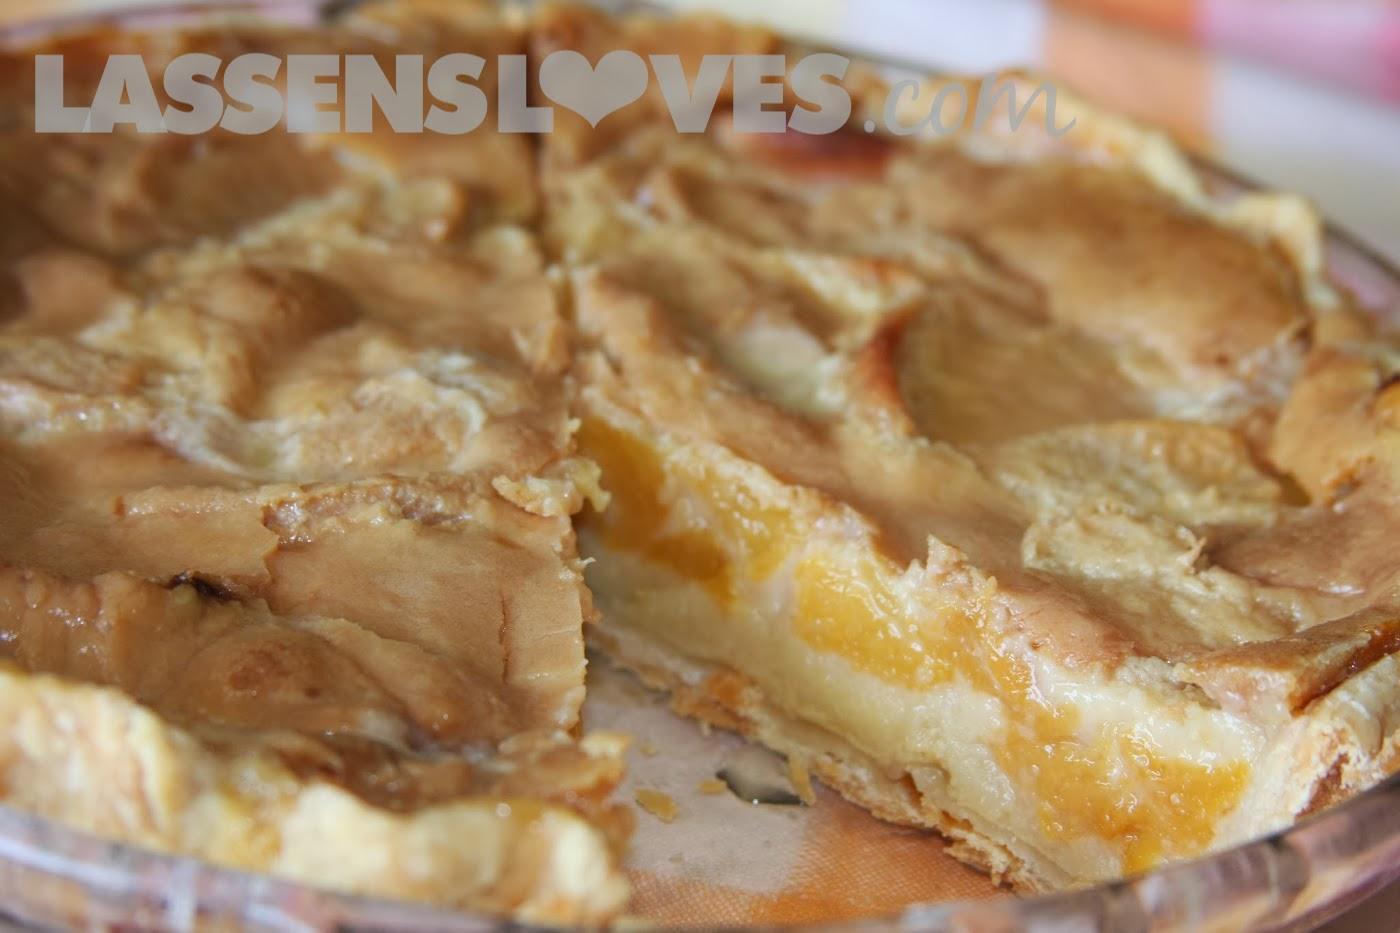 lassensloves.com, Lassen's, Lassens, Peach+Pie+Recipe, Pie+Crust+Recipe, Peach+Pie, Pie+Crust